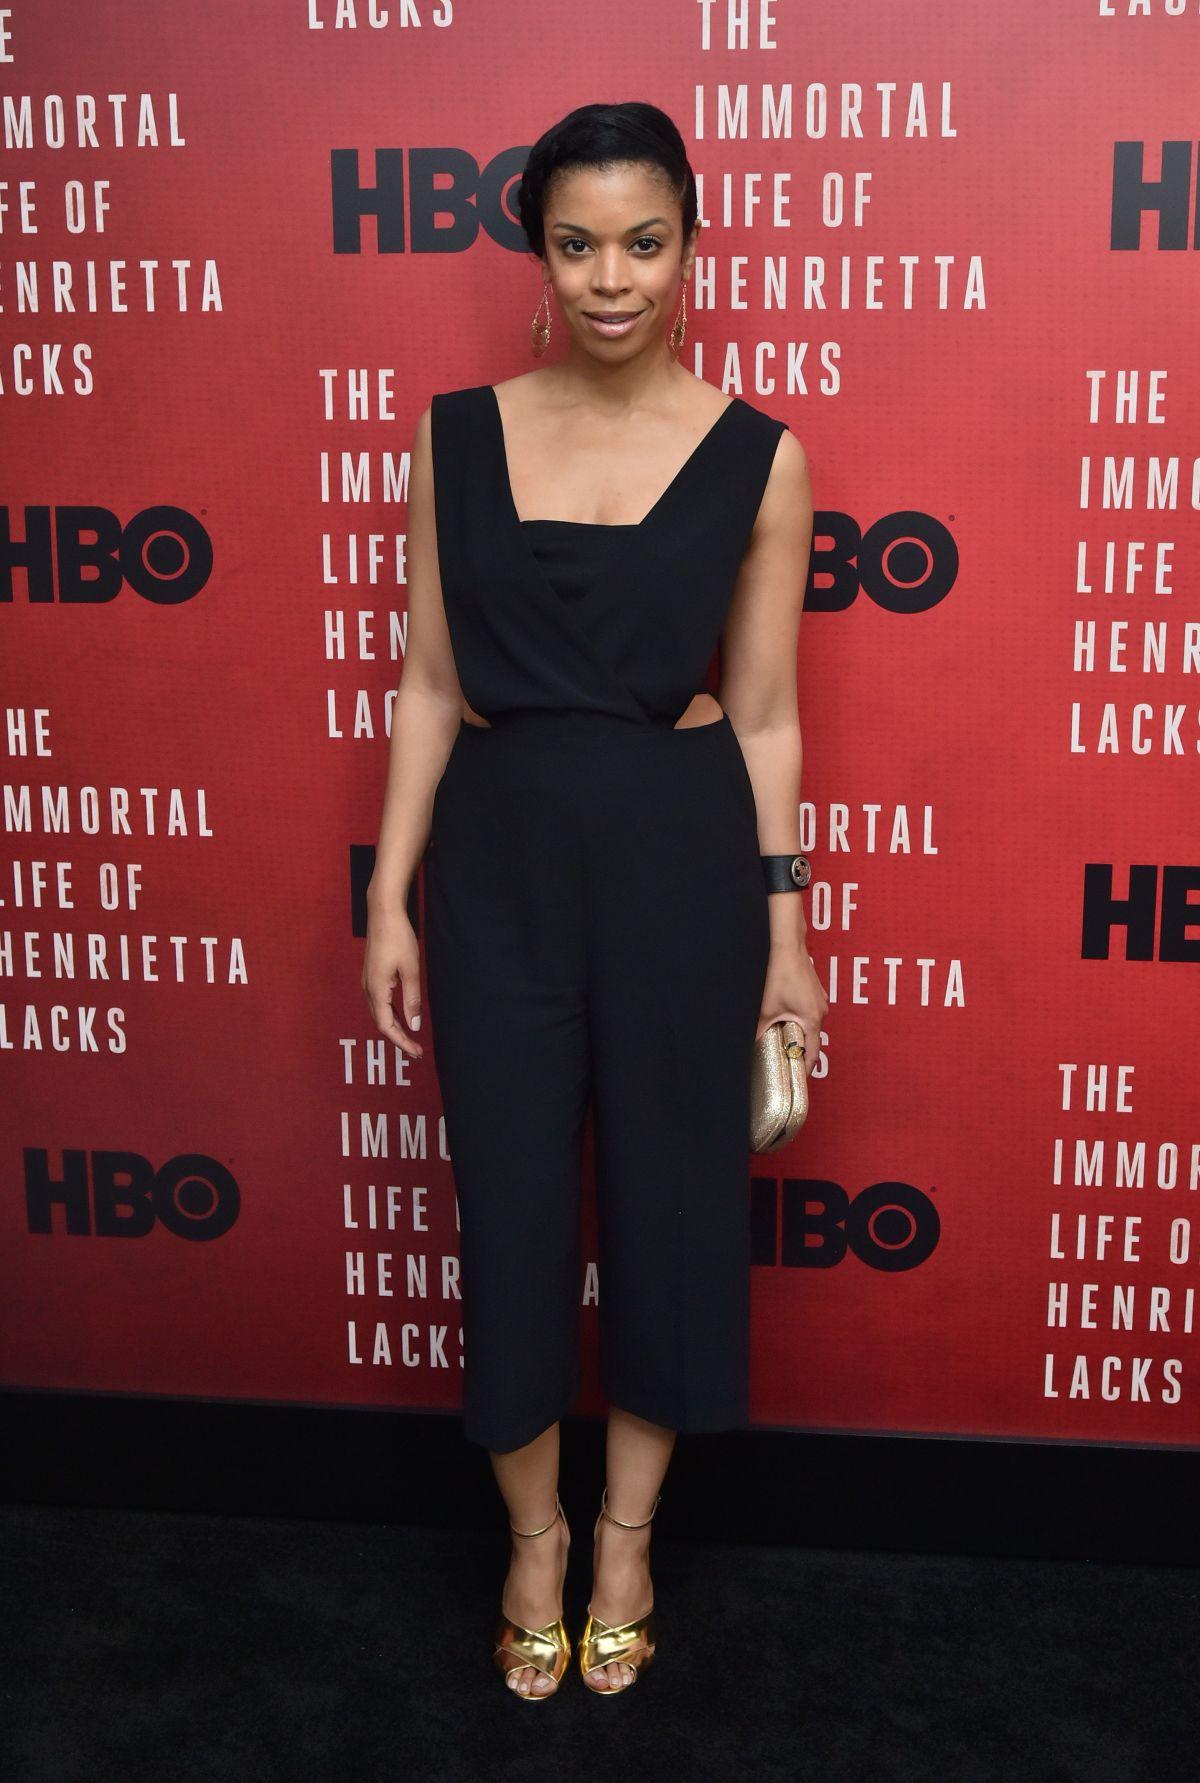 SUSAN KELECHI WATSON at The Immortal Life of Henrietta Lacks Screening in New York 04/18/2017